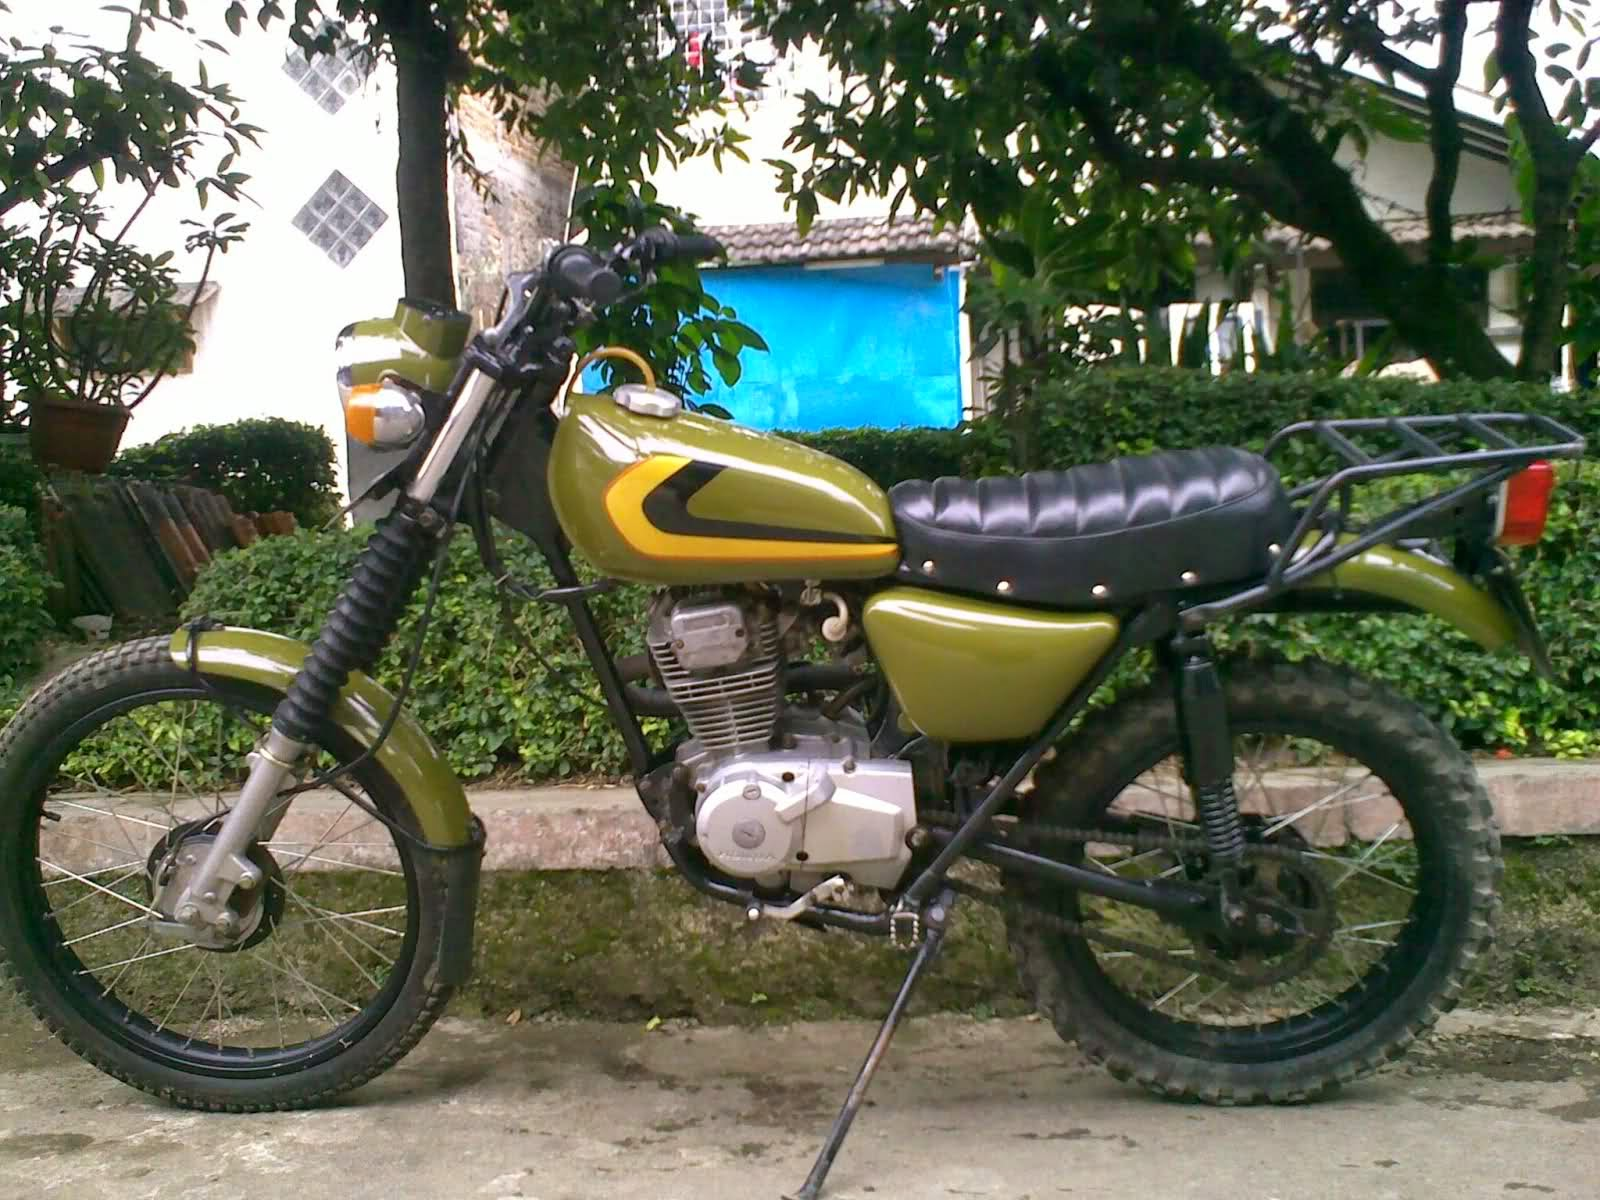 Jual Motor Cafe Racer Surabaya